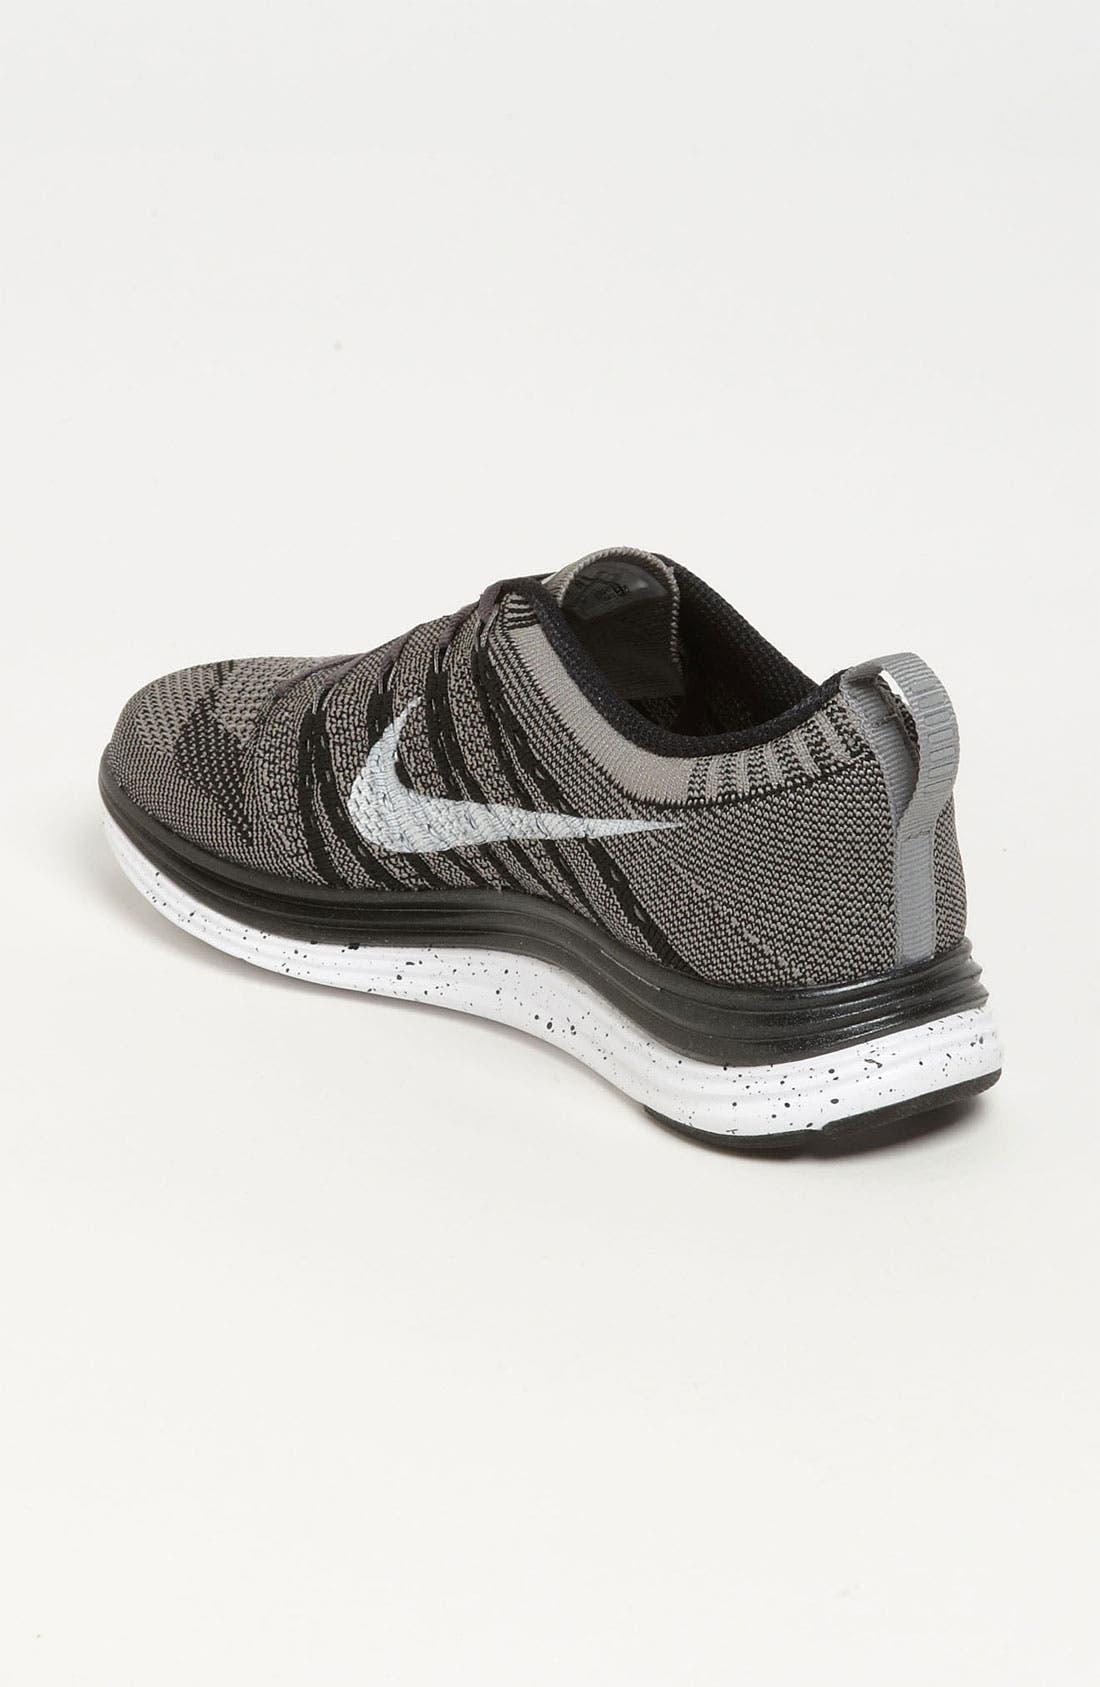 1cb35ae0561ac ... coupon nike flyknit lunar1 running shoe women nordstrom b51a1 09d87